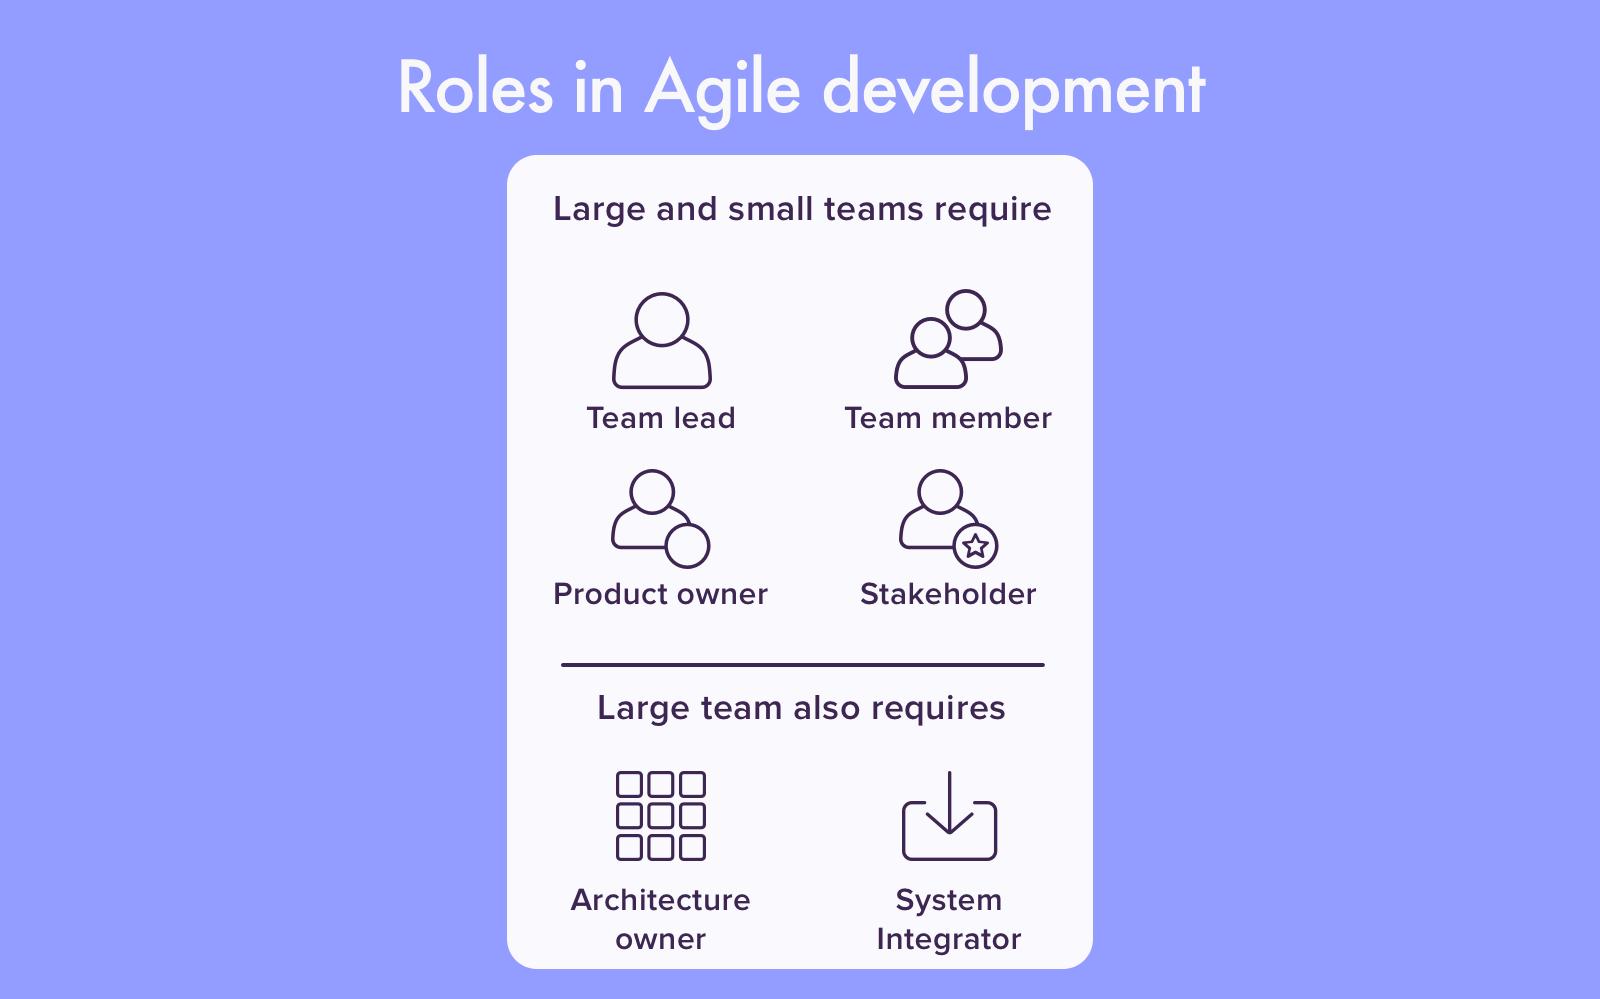 Roles in Agile development